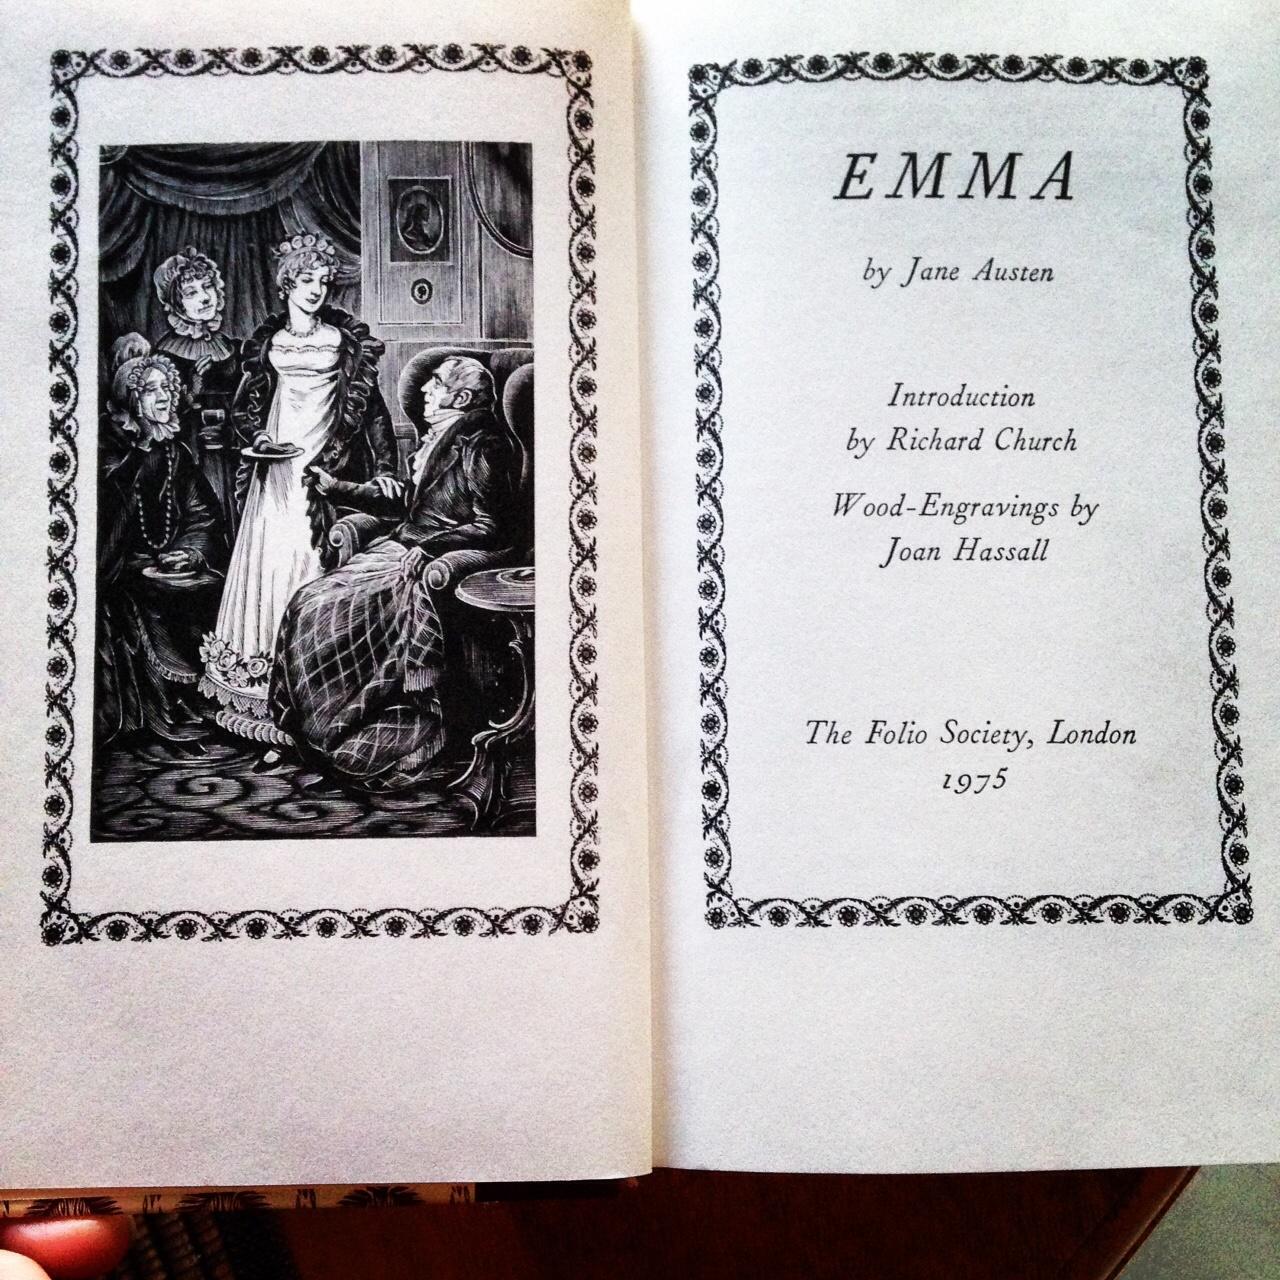 brona s books emma by jane austen title page of my folio society copy of emma